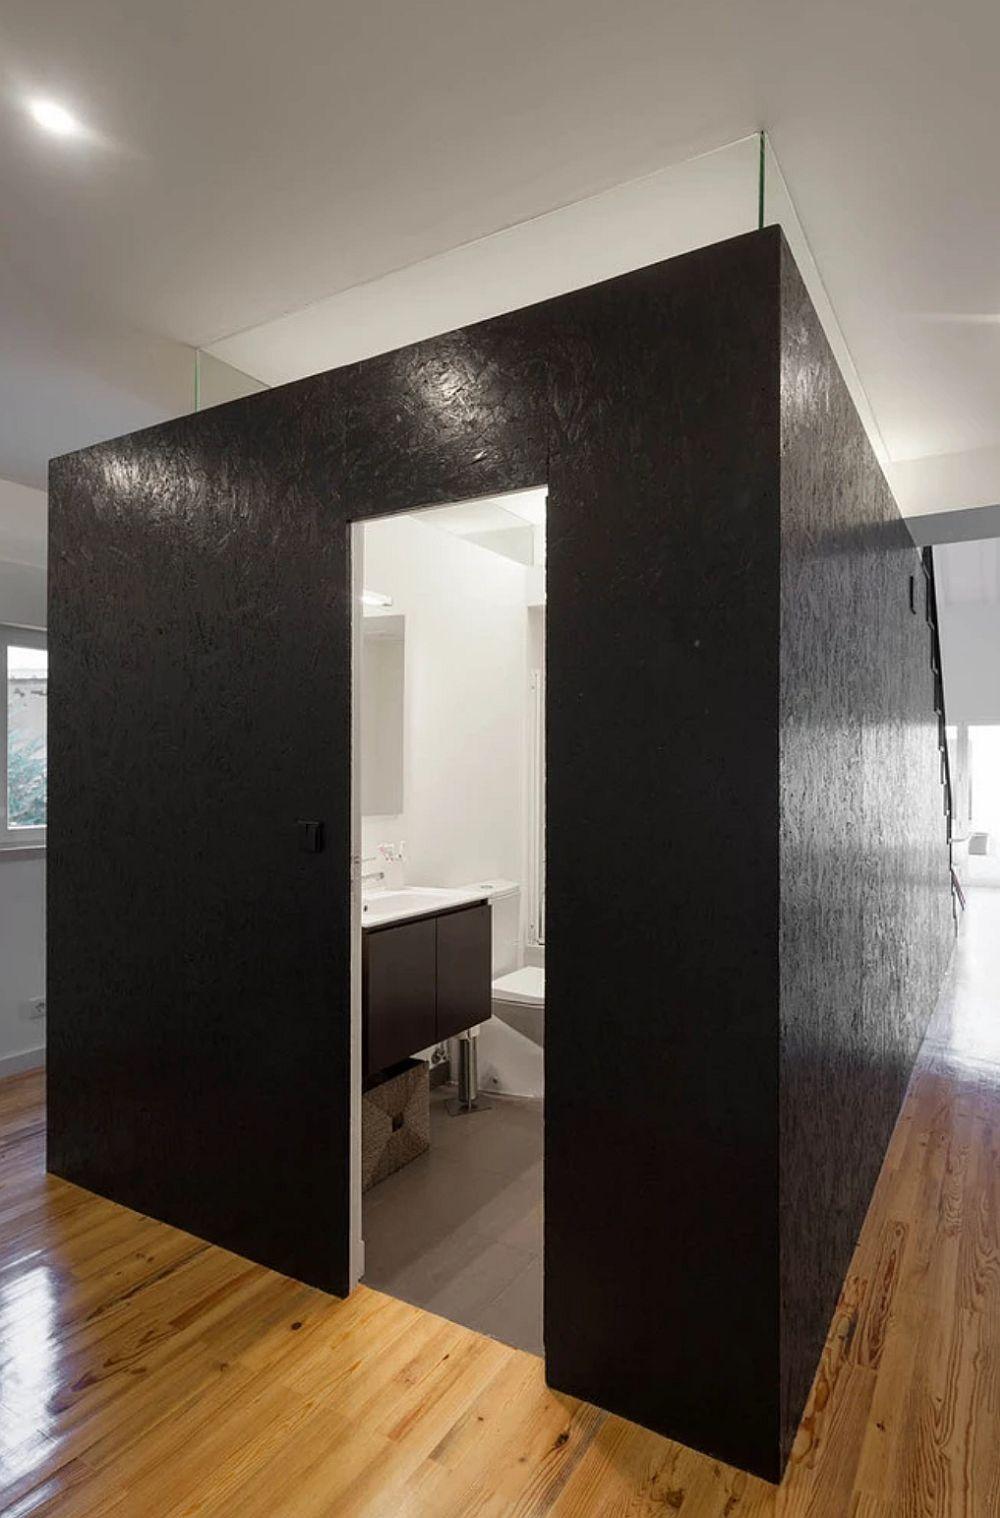 adelaparvu.com despre casa amenajata in grajd, Casa Celerio, arhitectura Ines Brandao (14)